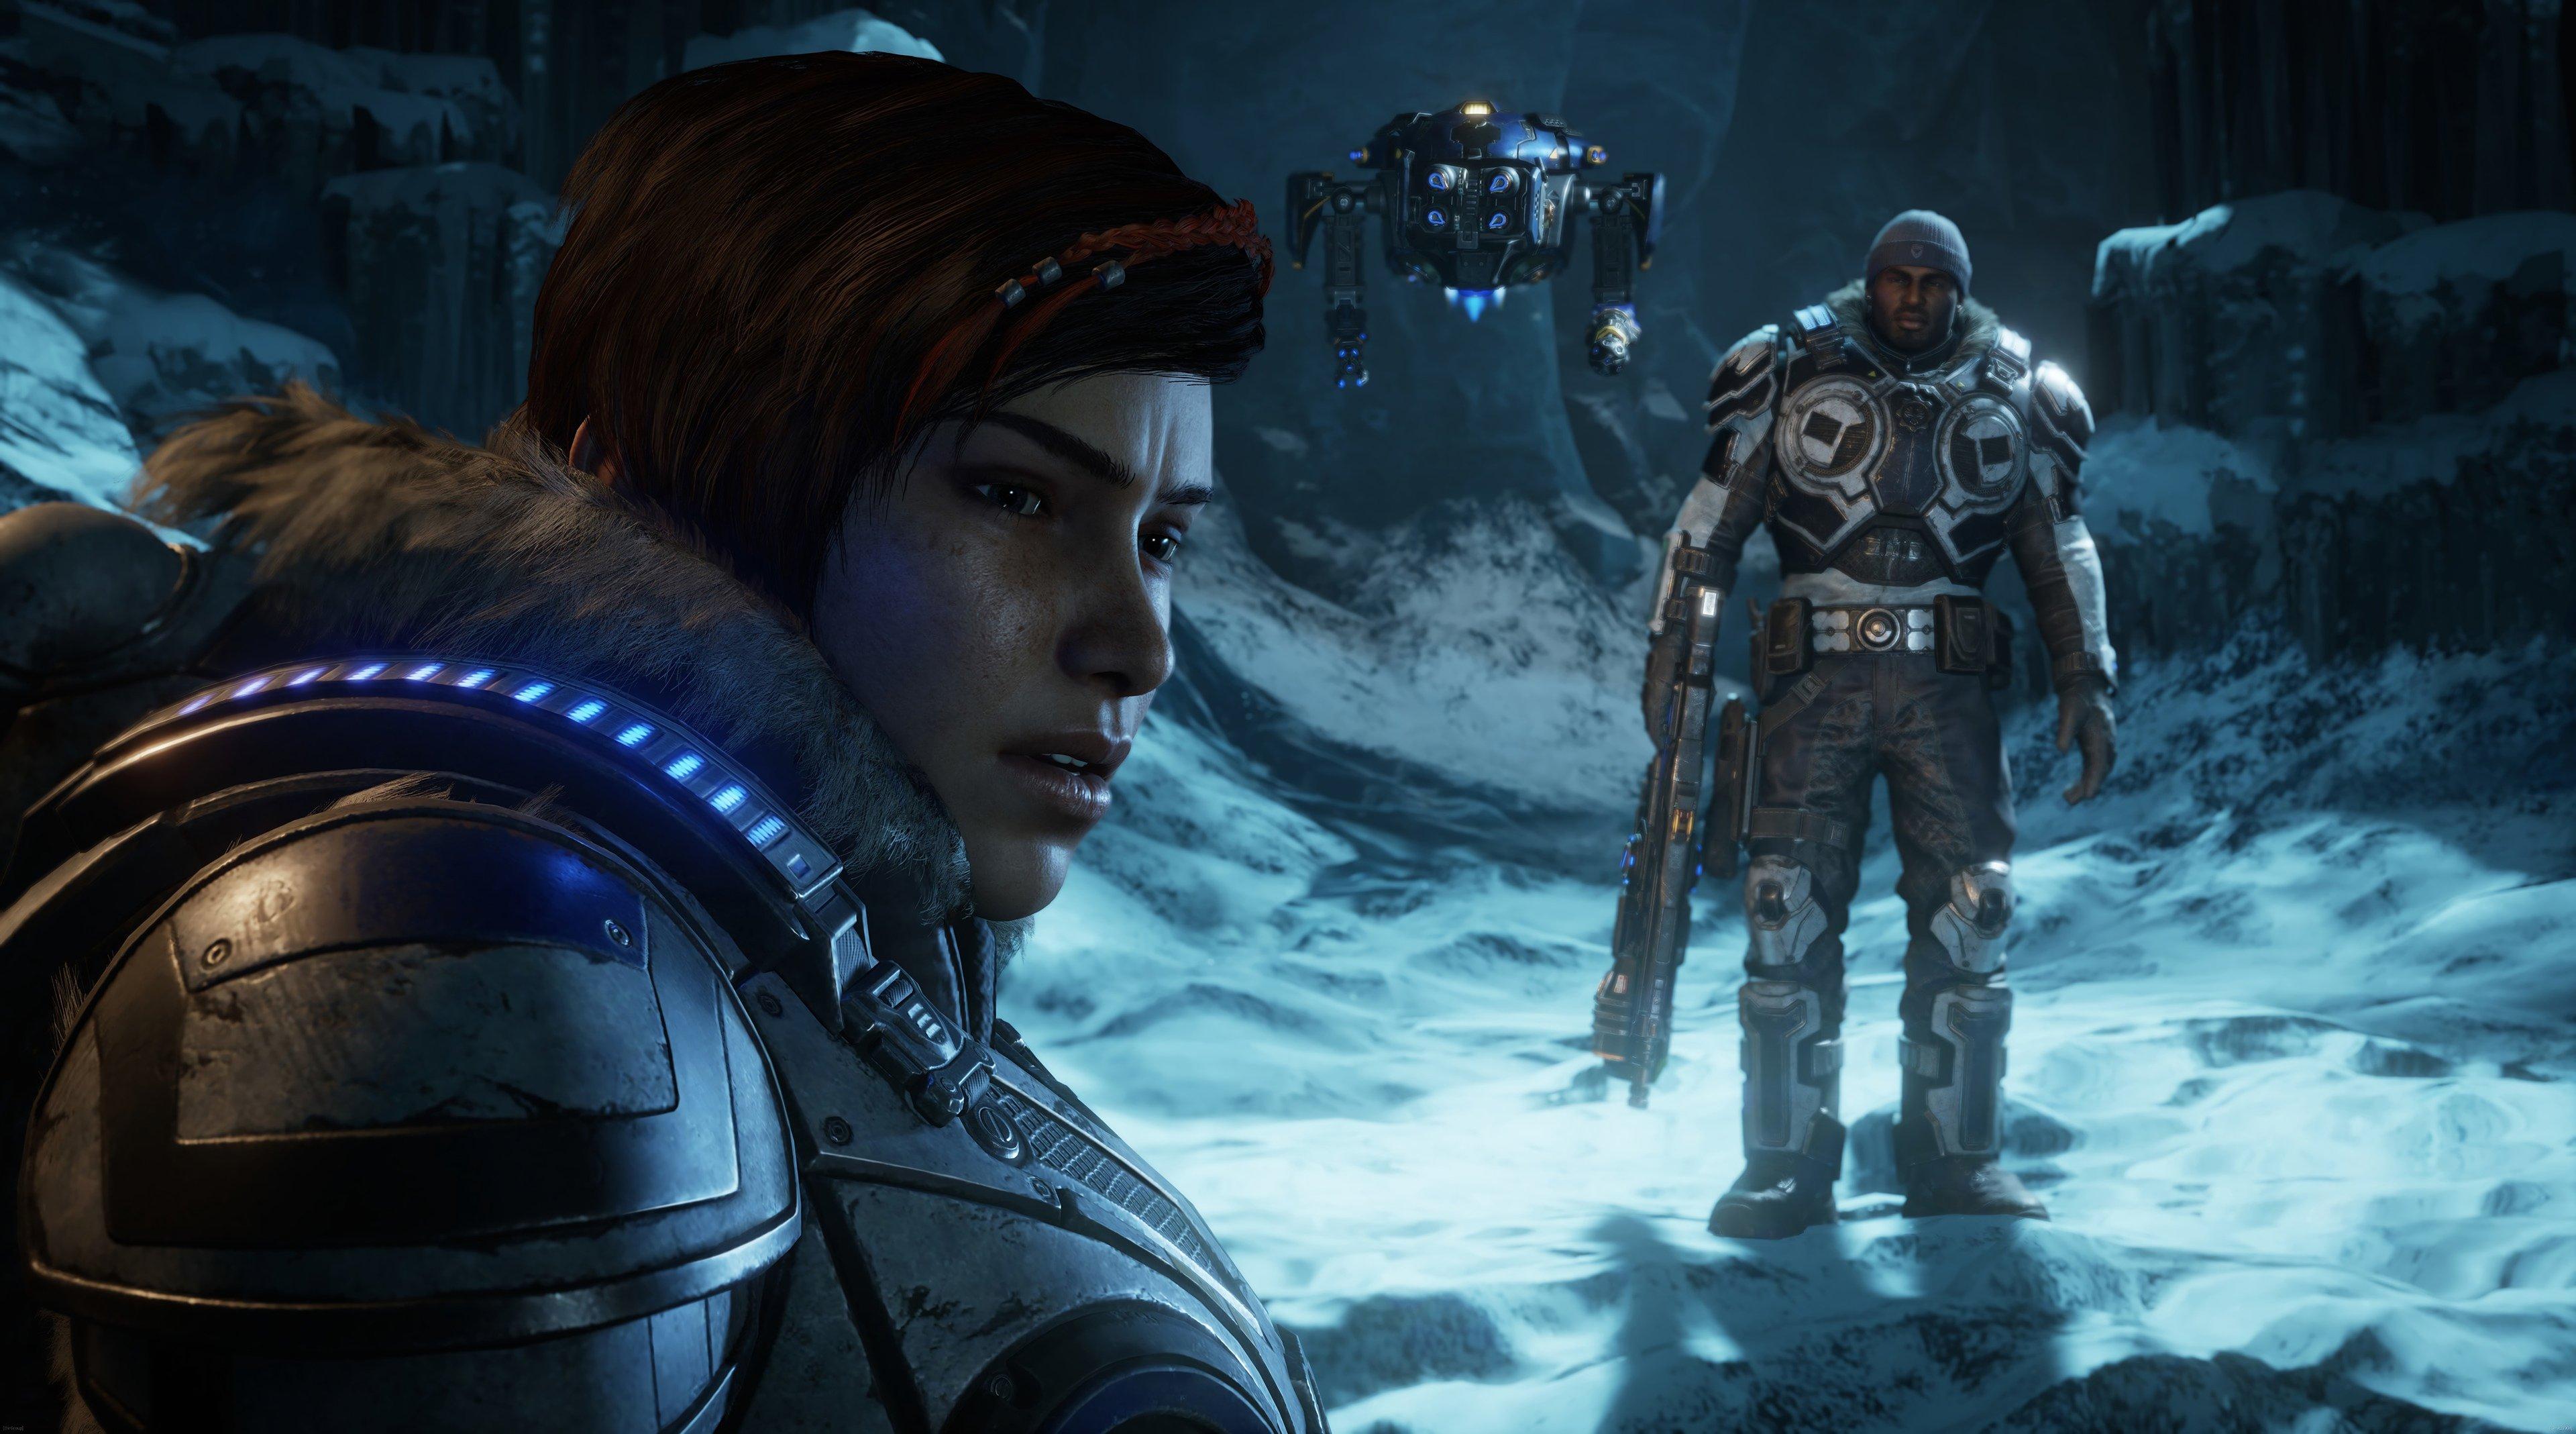 Fondos de pantalla Personajes de Gears of War 5